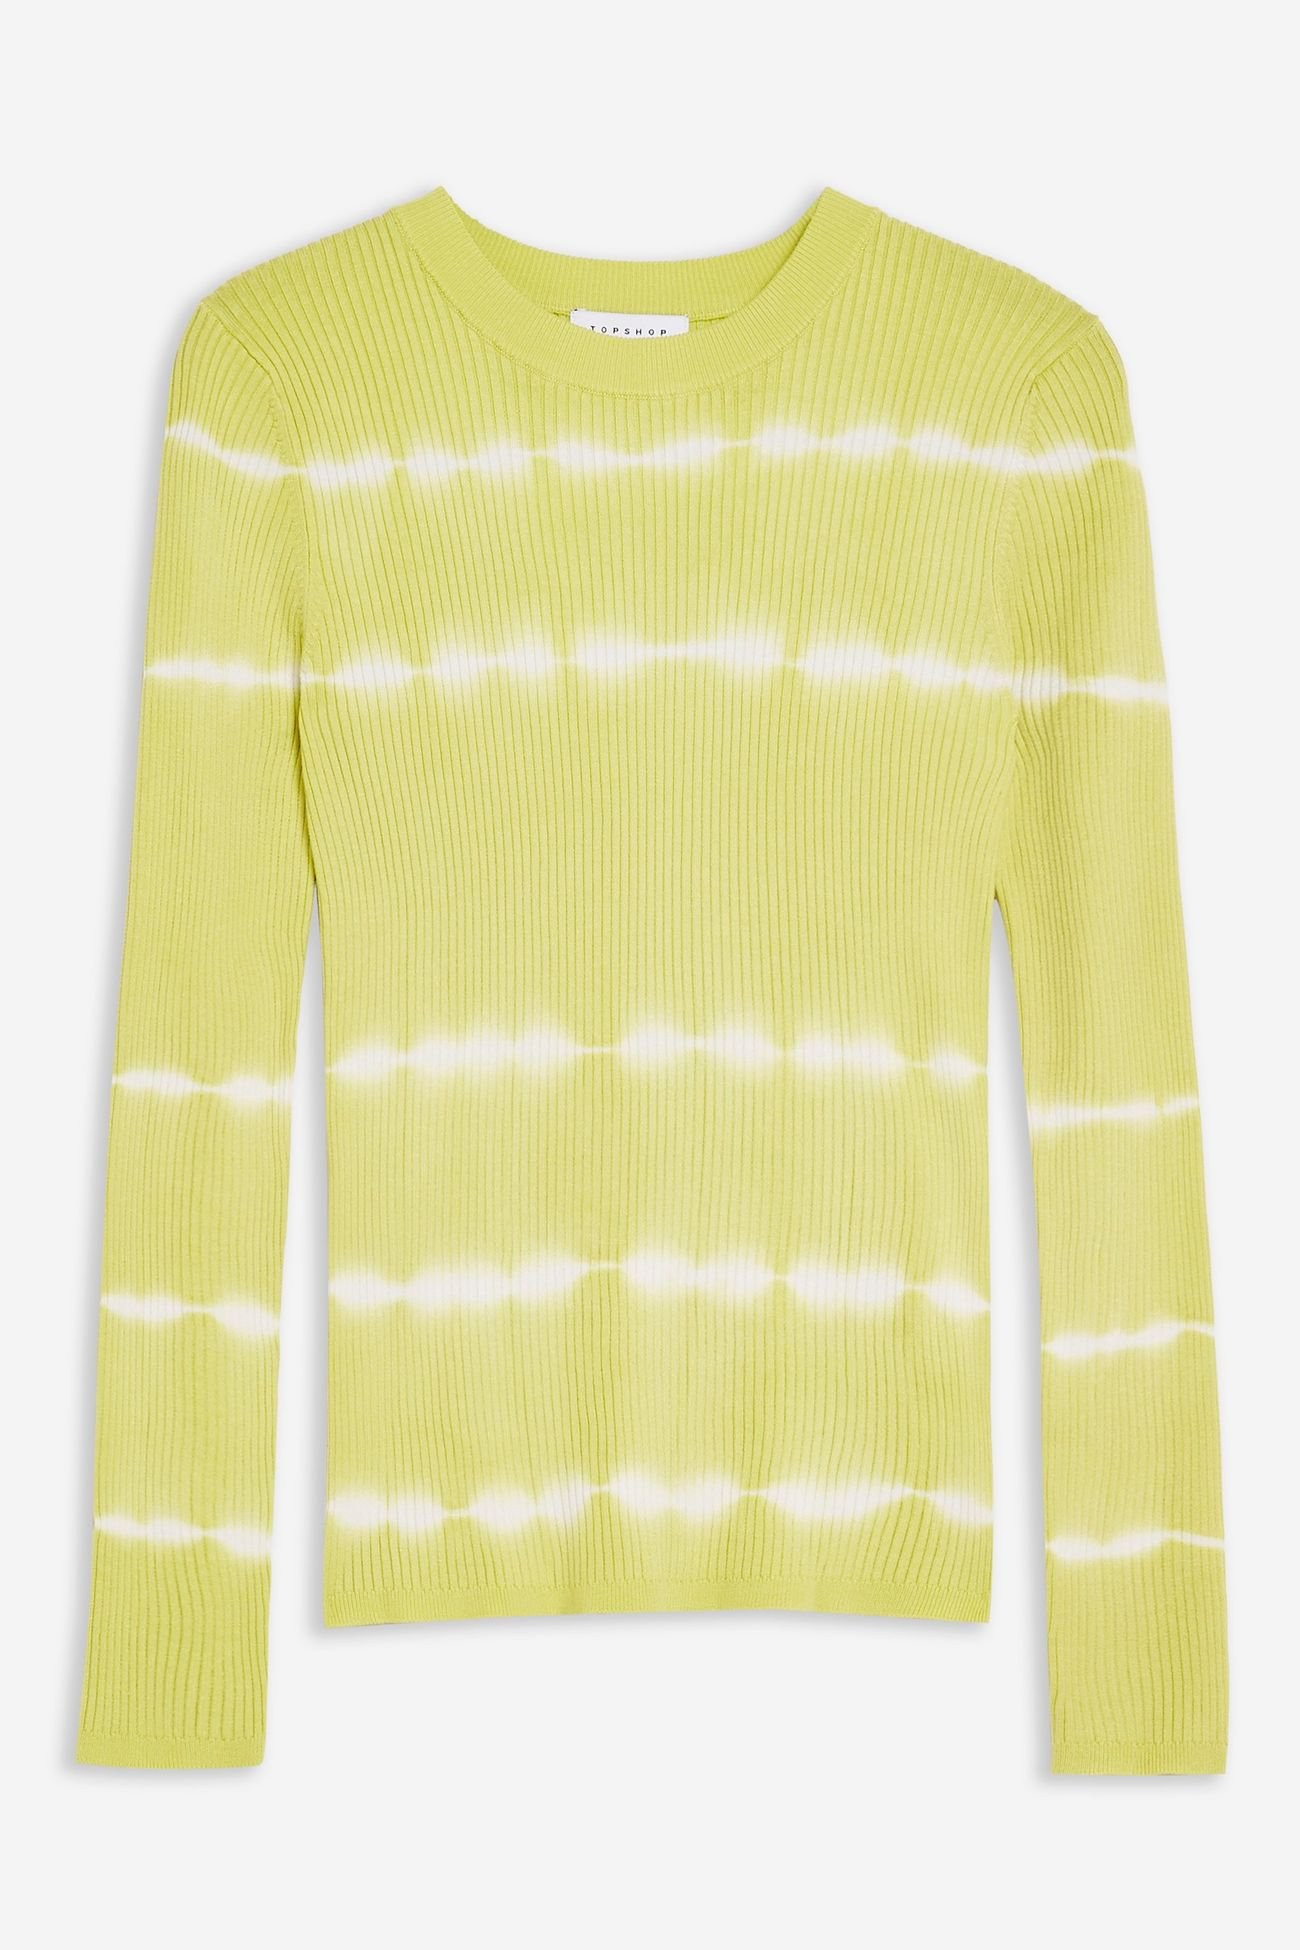 Tie Dye Knitted Top | Topshop